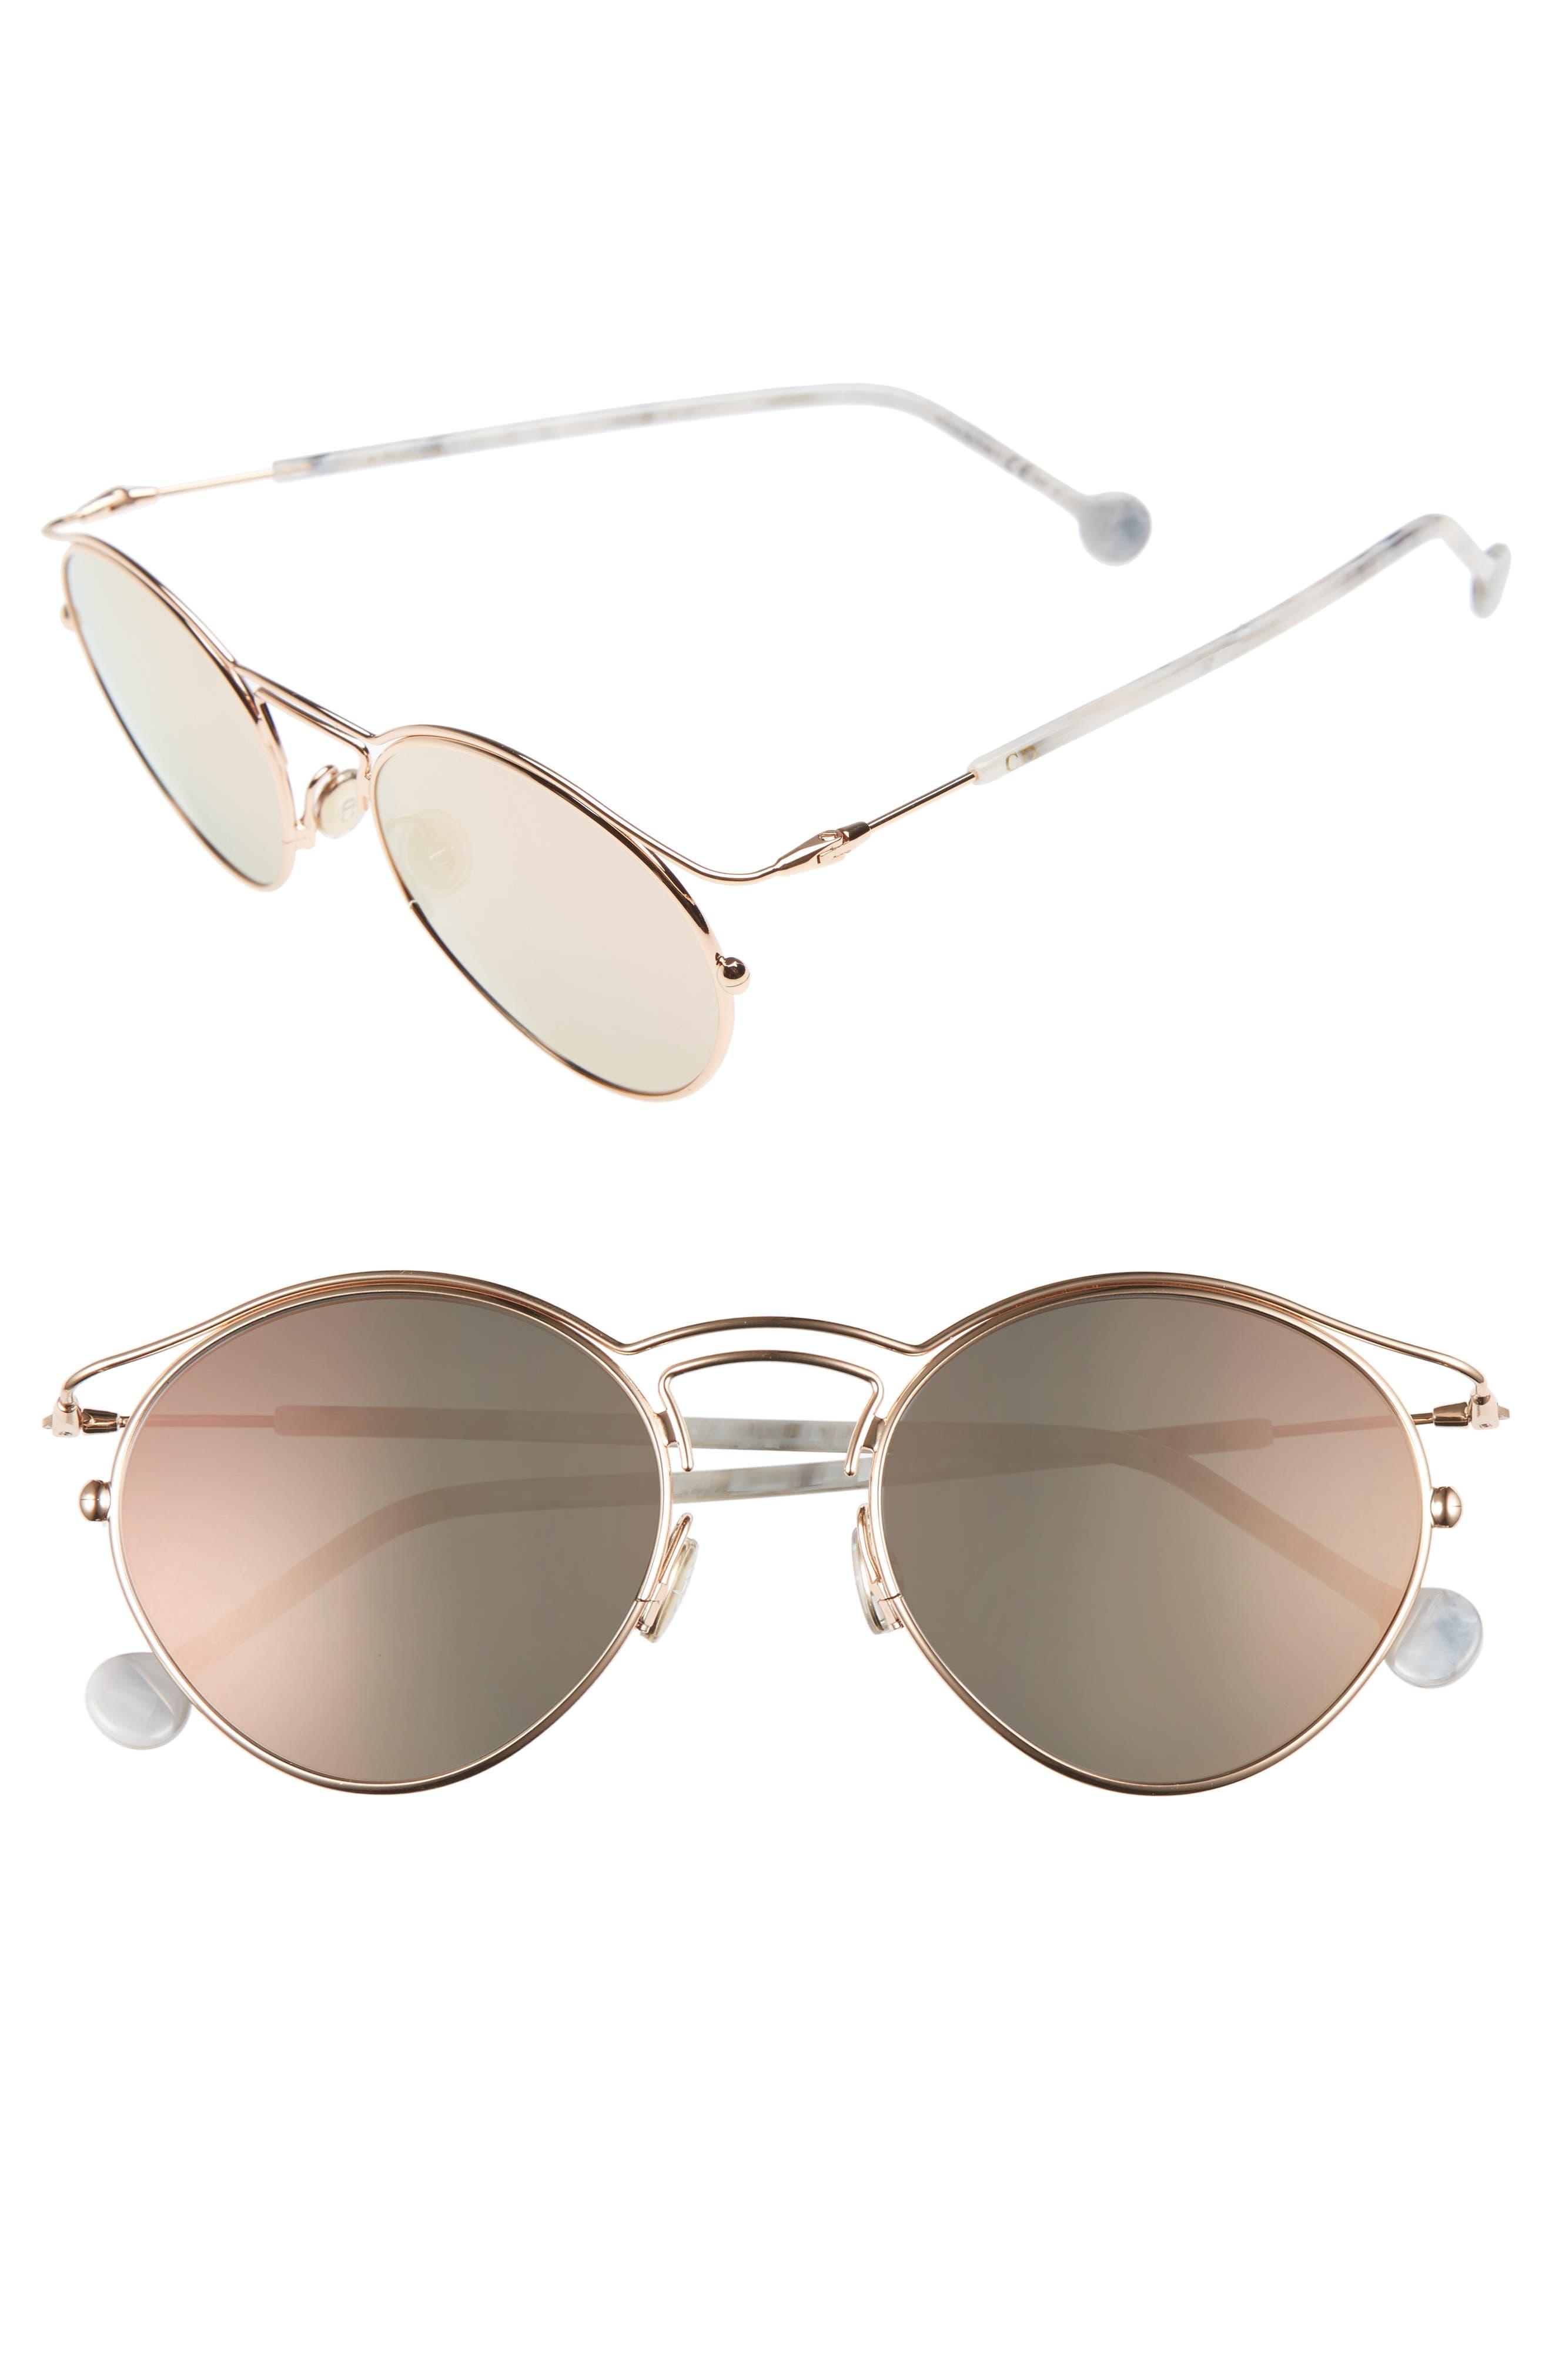 Dior Origin 53mm Sunglasses